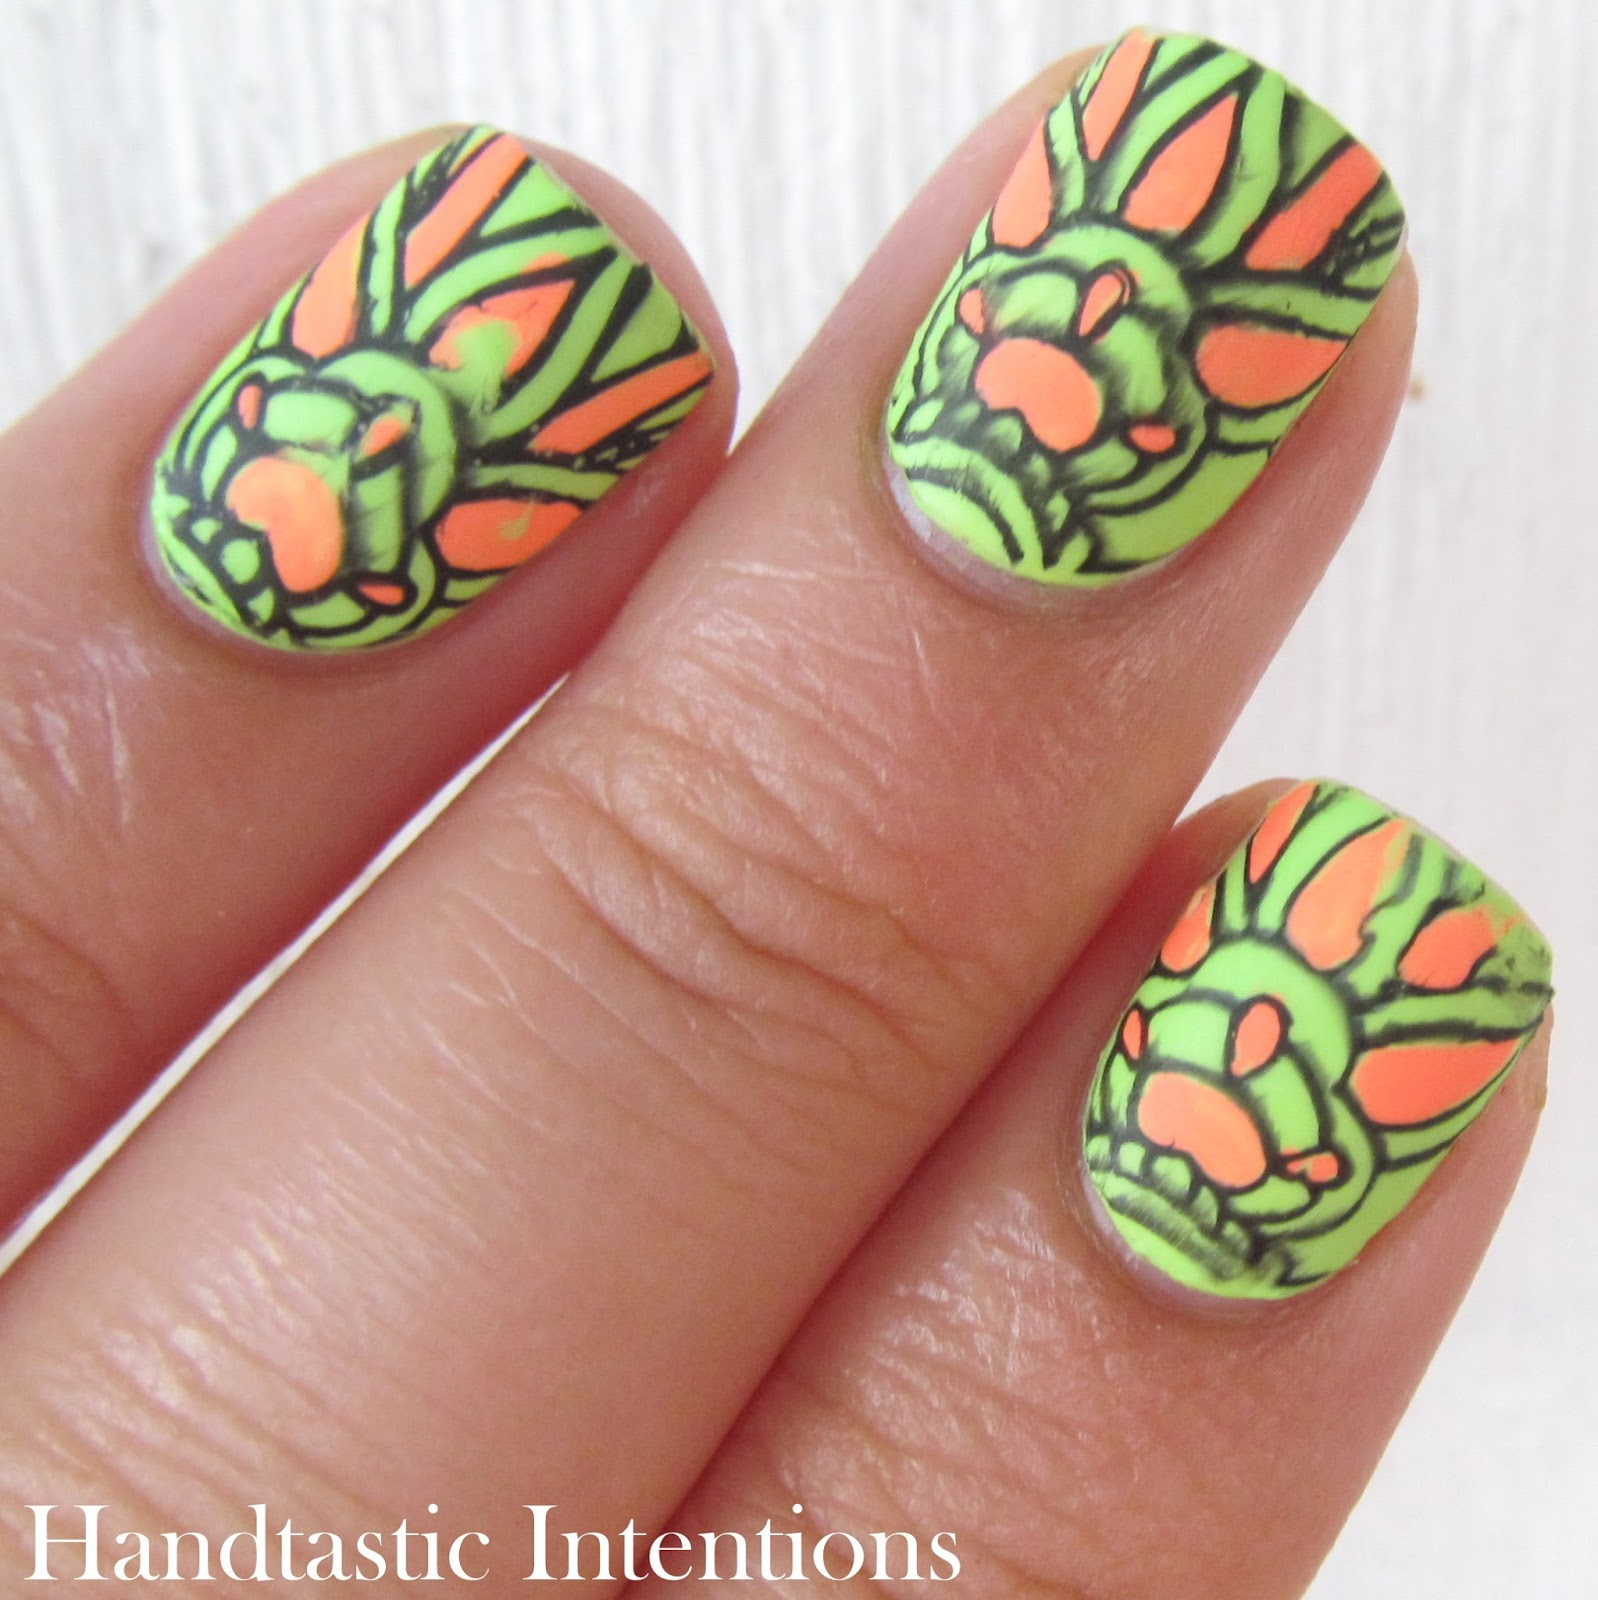 Advanced Nail Art: Handtastic Intentions: Neon Week Nail Art: Neon Advanced